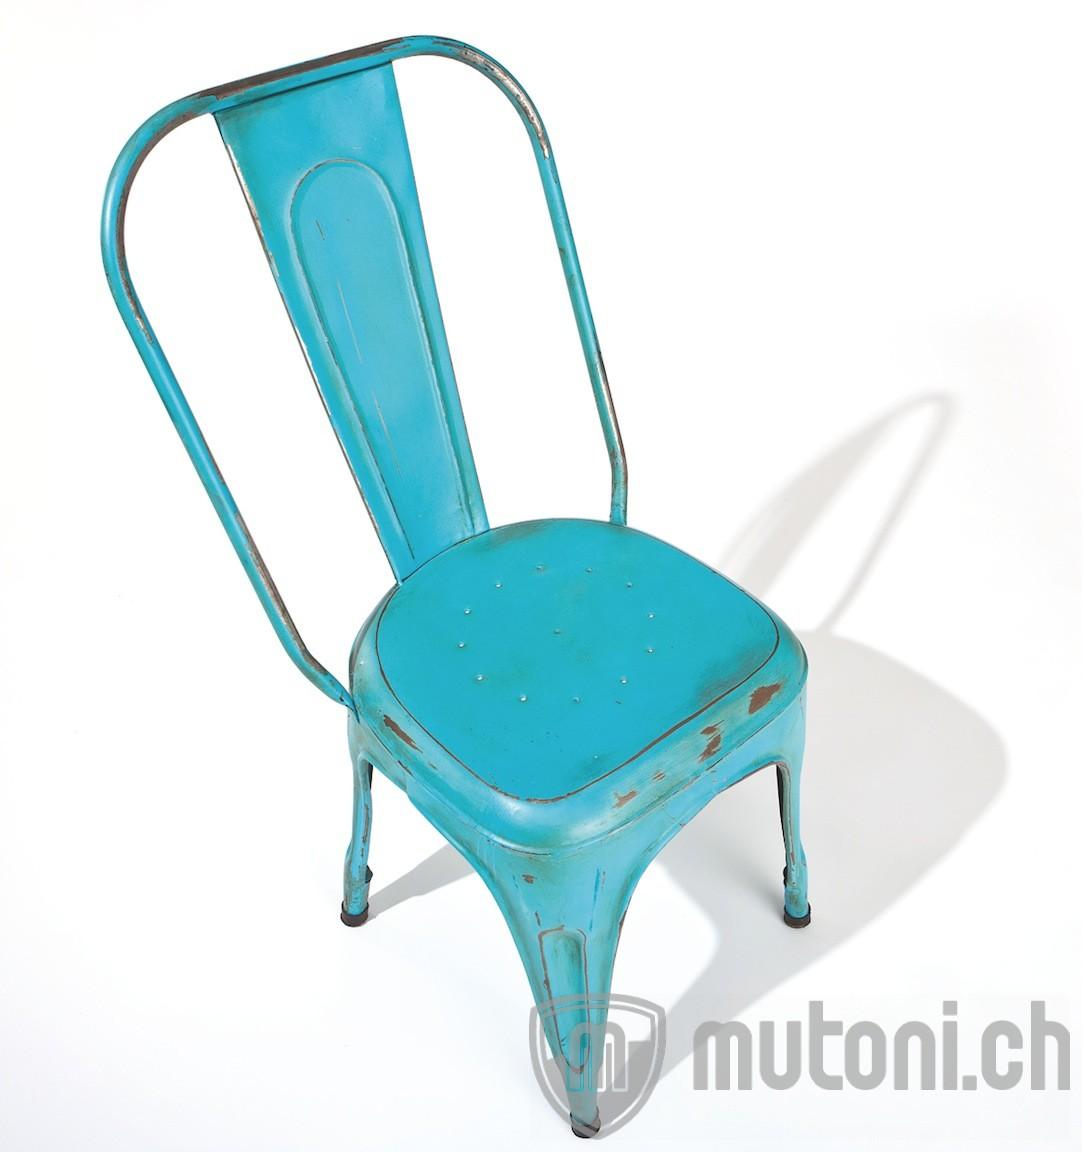 metallstuhl industry t rkis blau 4er set mutoni. Black Bedroom Furniture Sets. Home Design Ideas